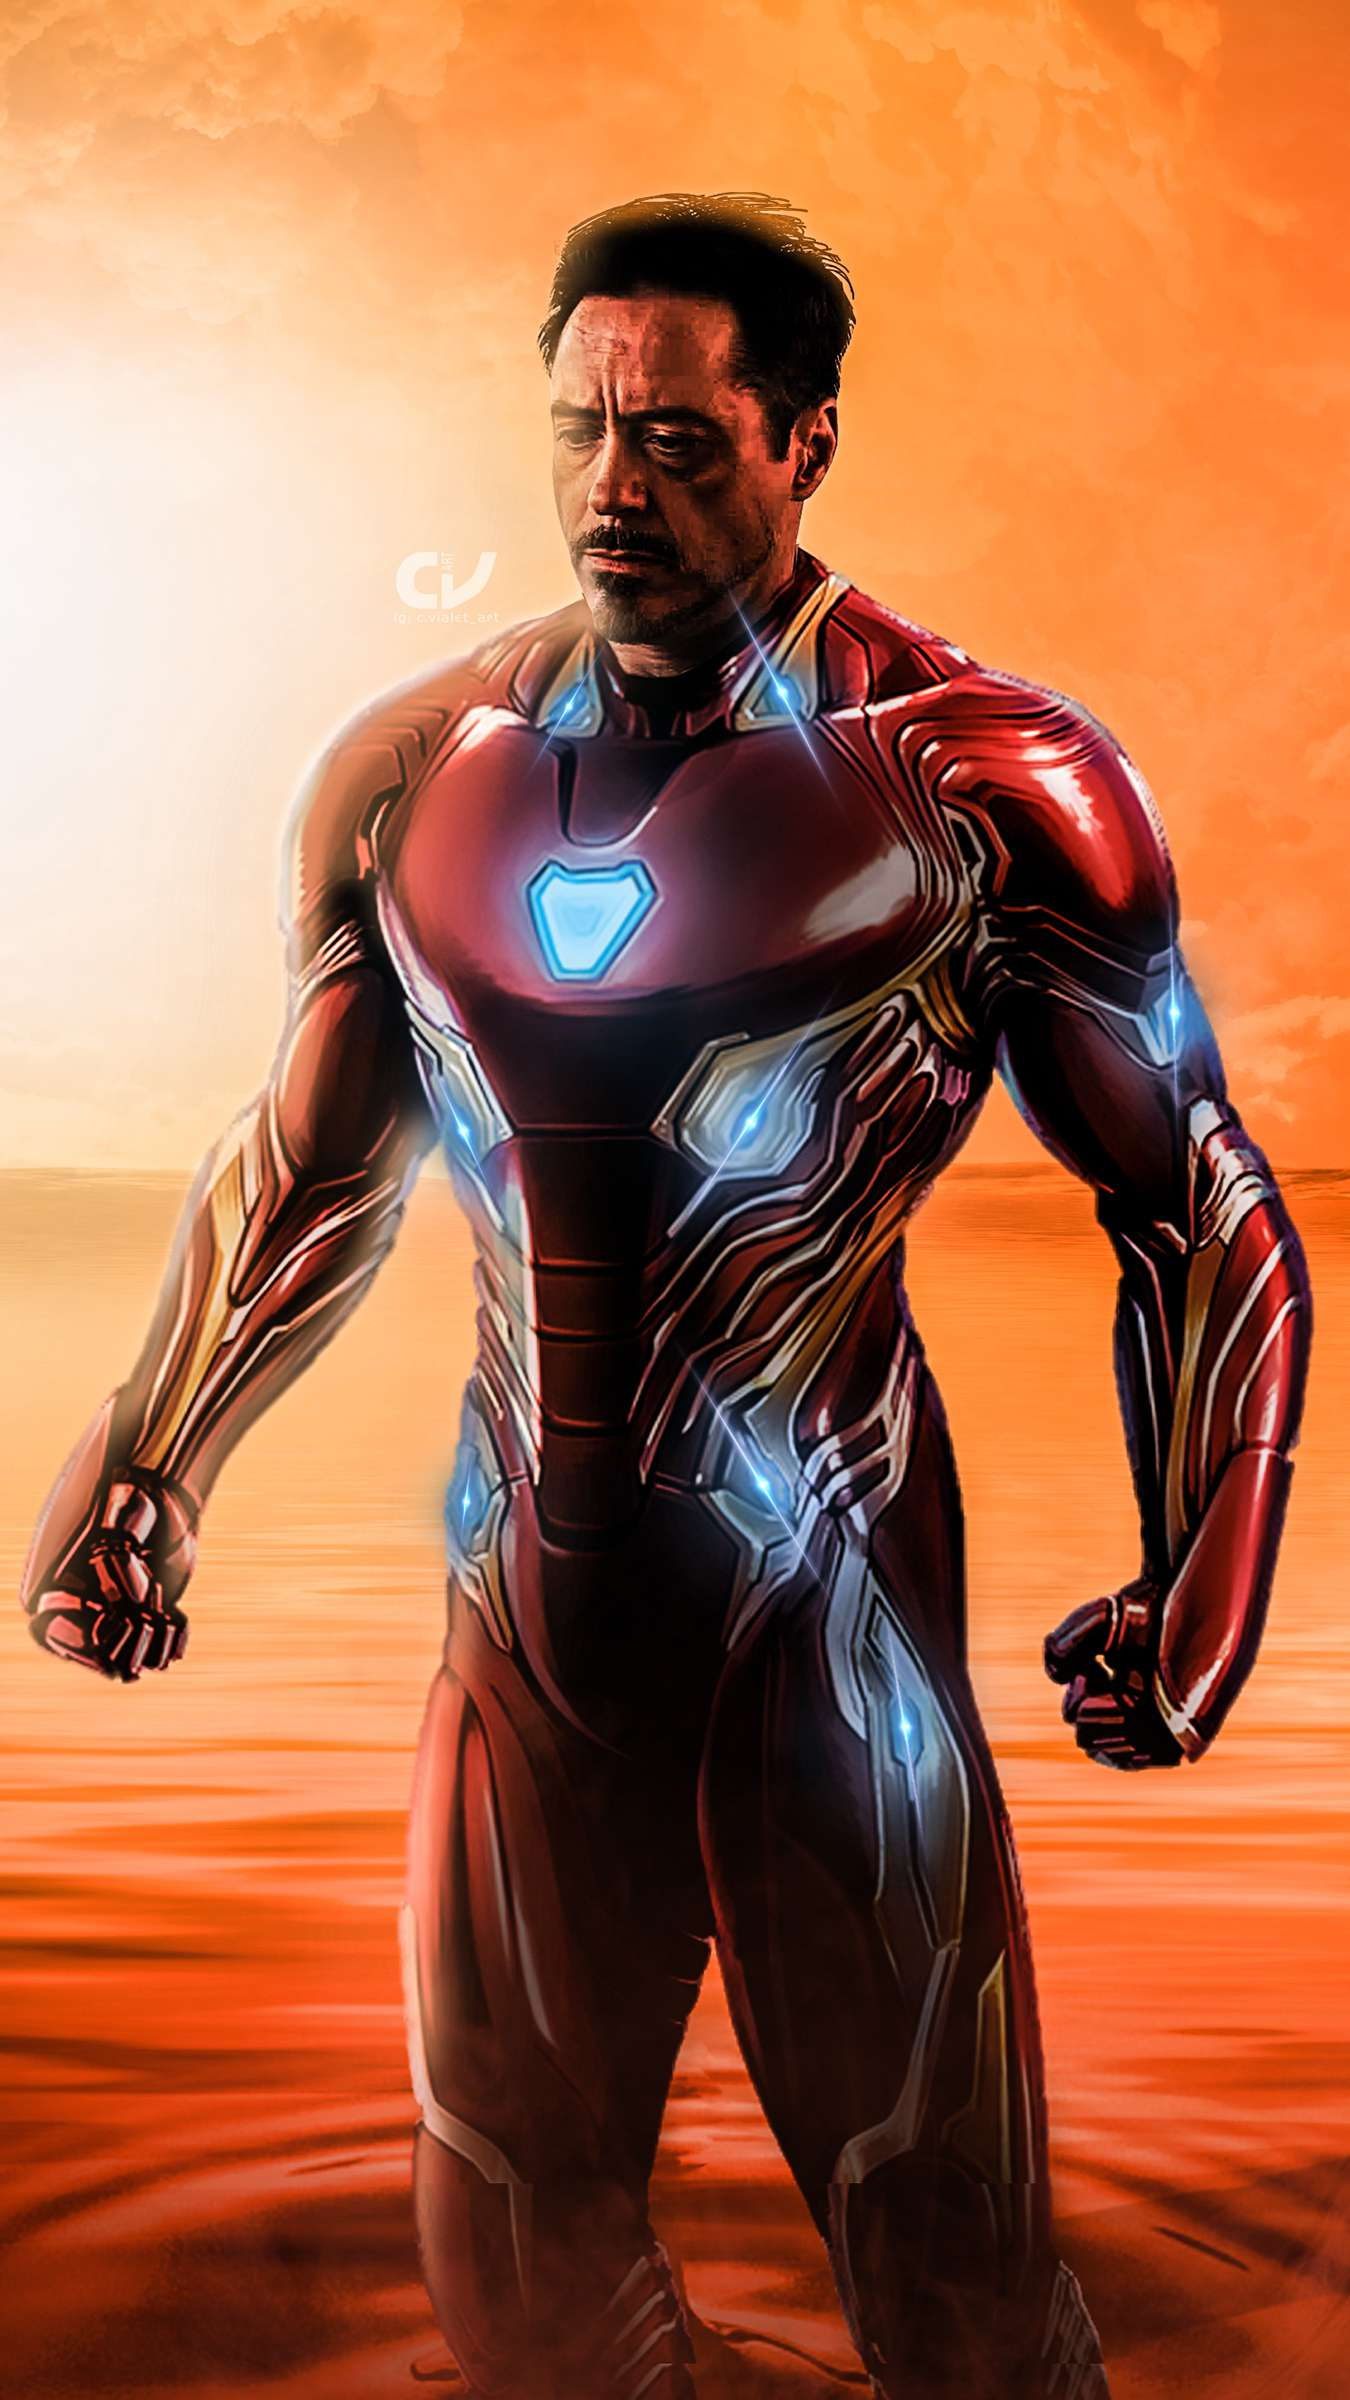 Avengers Endgame Iron Man in Soul World iPhone Wallpaper